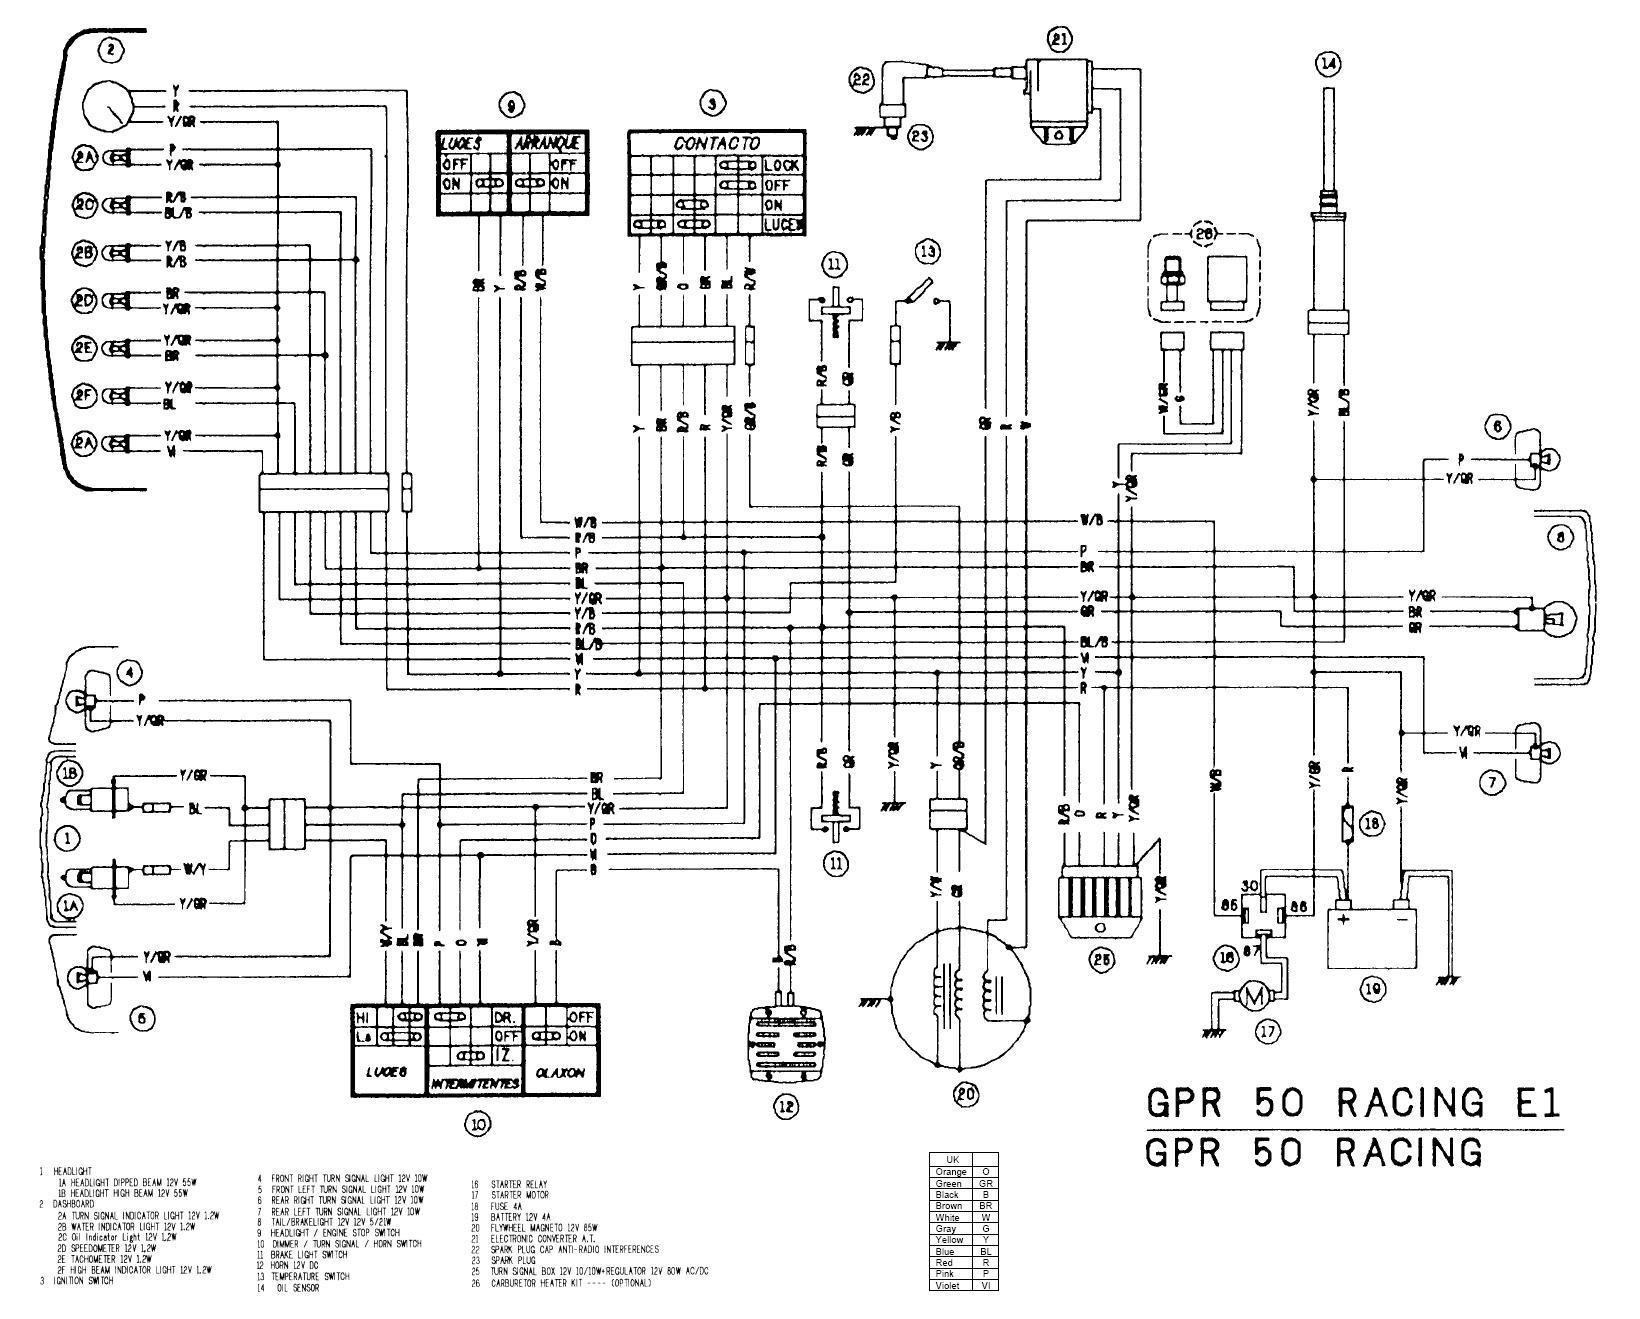 Yamaha Neo 50 Wiring Diagram / Yamaha Neos 100 Wiring